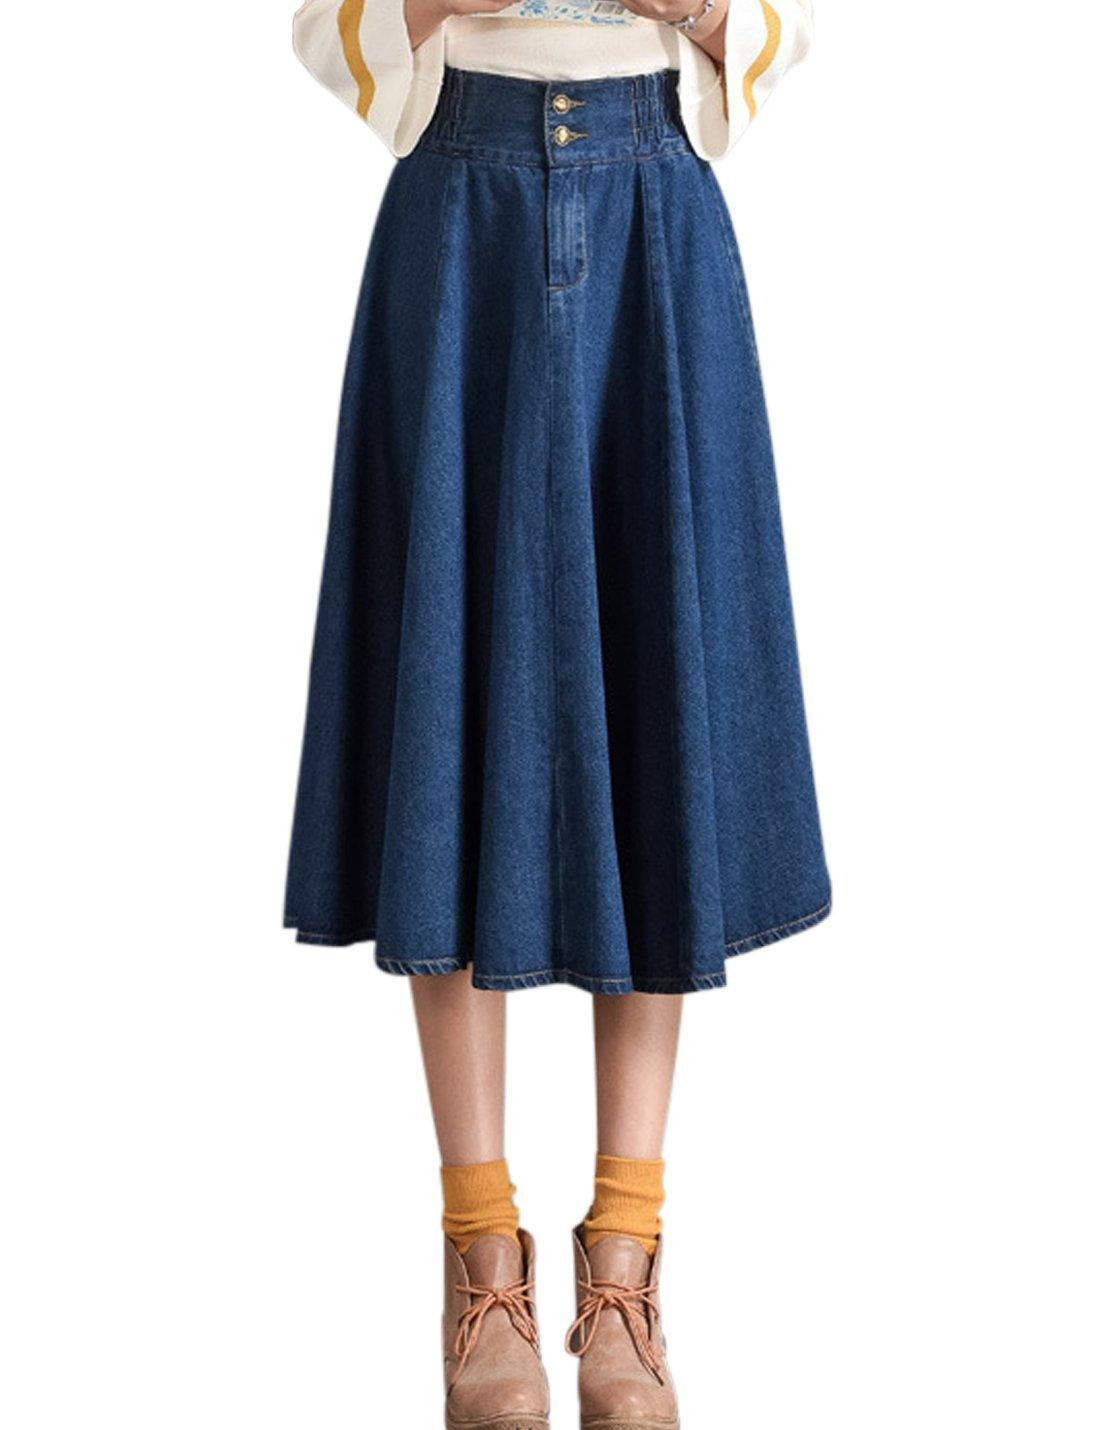 18e5d6b648 Tanming Women s Elastic Waist A-Line Pleated Midi Denim Skirt ...